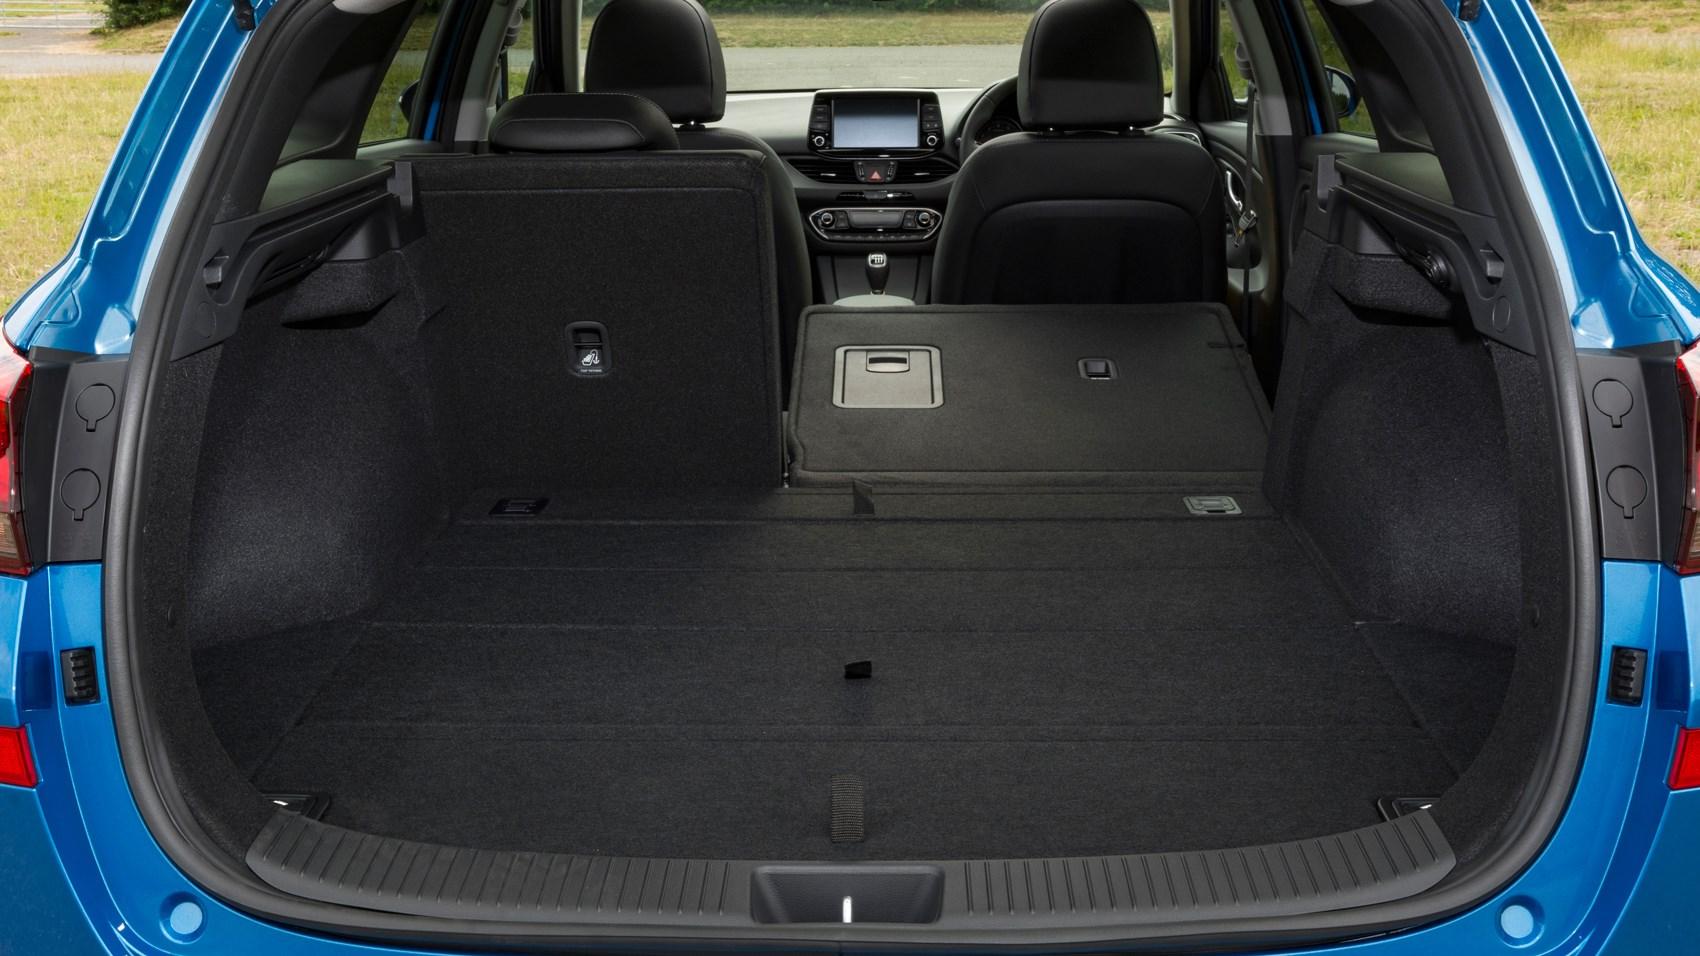 Hyundai i30 wagon boot space